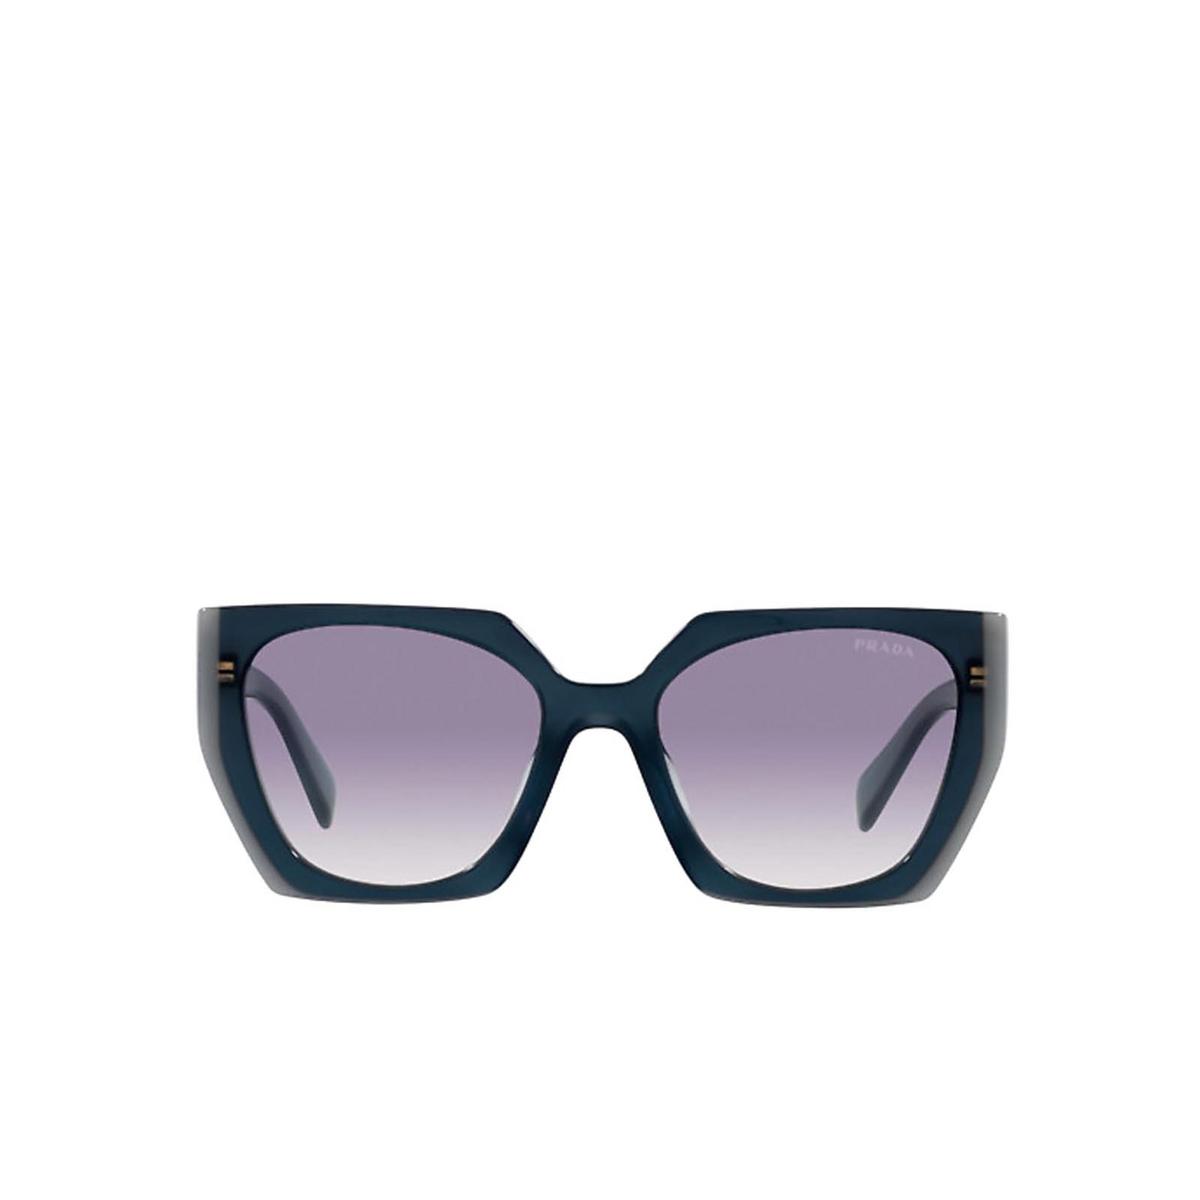 Prada® Square Sunglasses: PR 15WS color Opal Astral 07Q409 - front view.